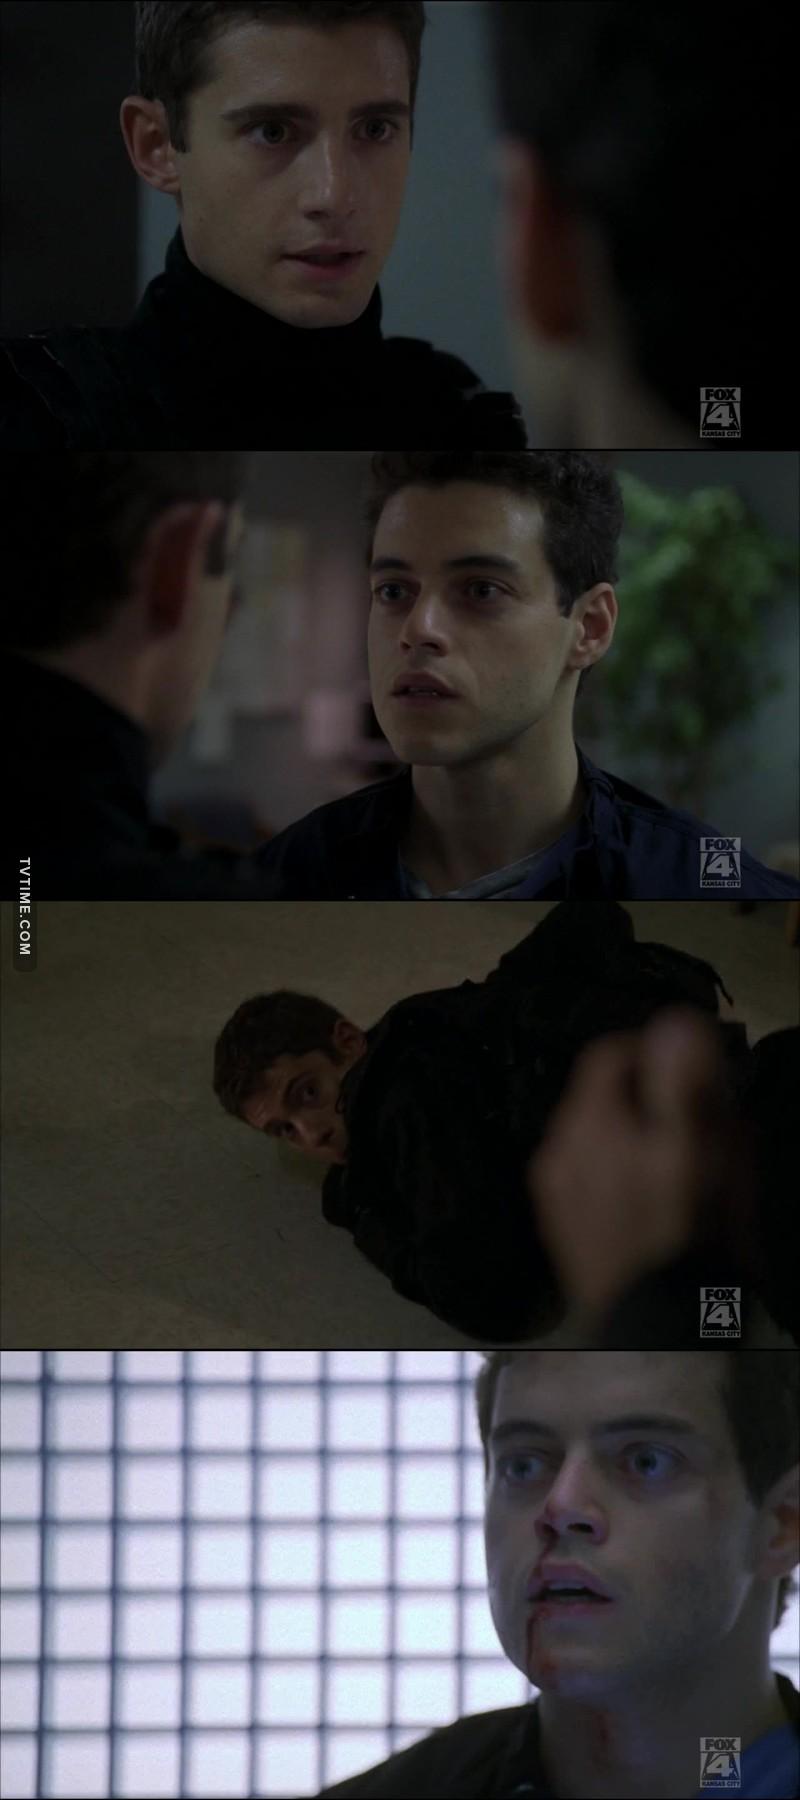 Le jeune agent Owen a eu du courage  face au terroriste.